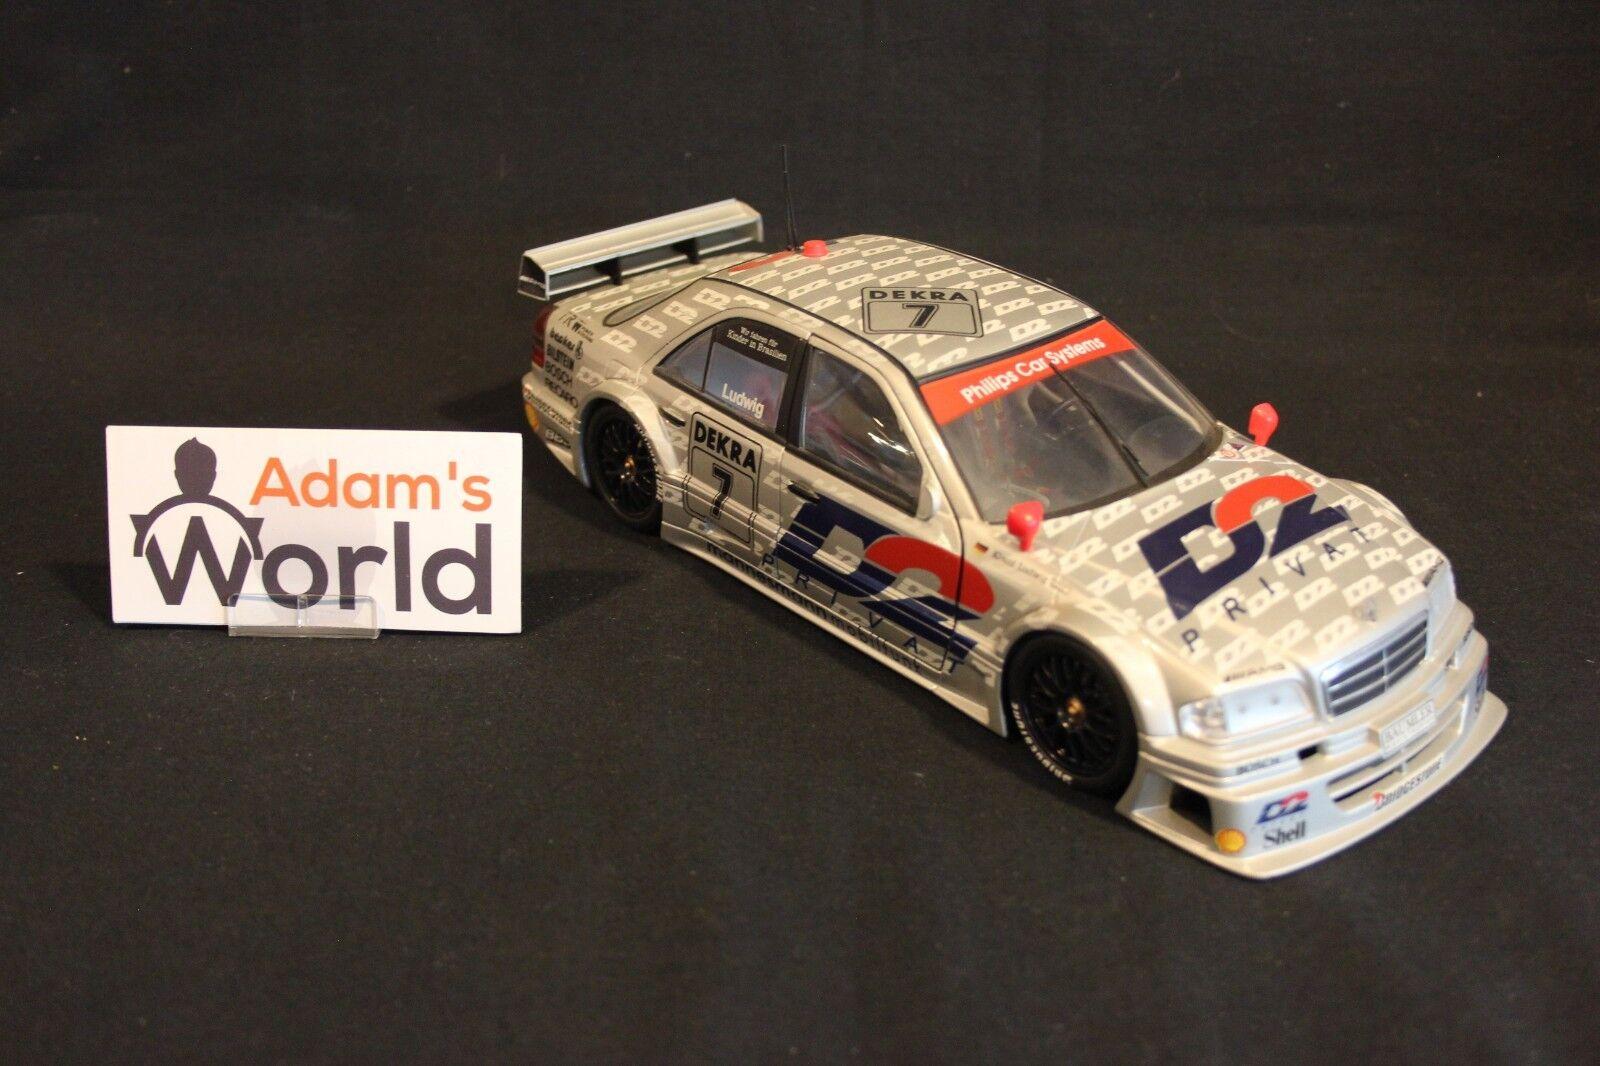 UT Models Mercedes-Benz C-Class DTM 1994 1 18  7 Klaus Ludwig (GER) (MM1)